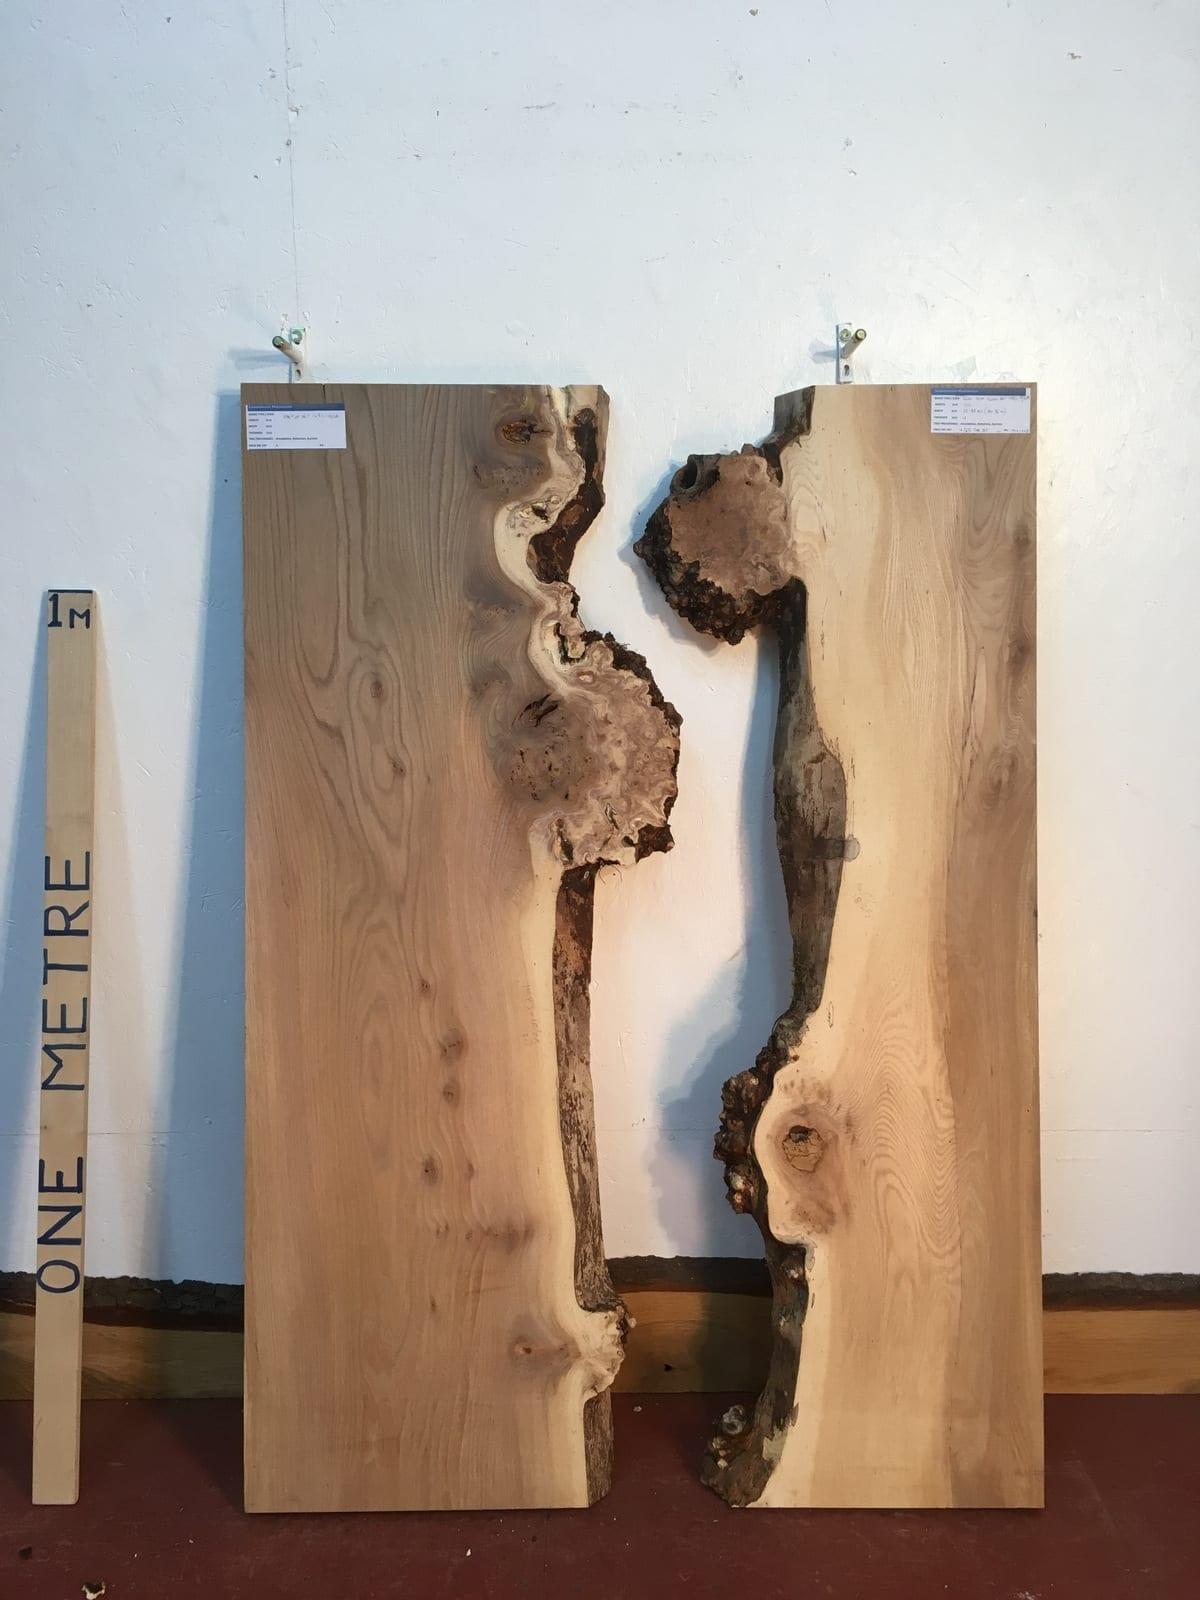 BURRY ELM 1483-1B/2B River Set Single Waney Natural Live Edge Slabs Planed Kiln Dried Seasoned Hardwood Board Thickness 4cm Wildwood River Tables